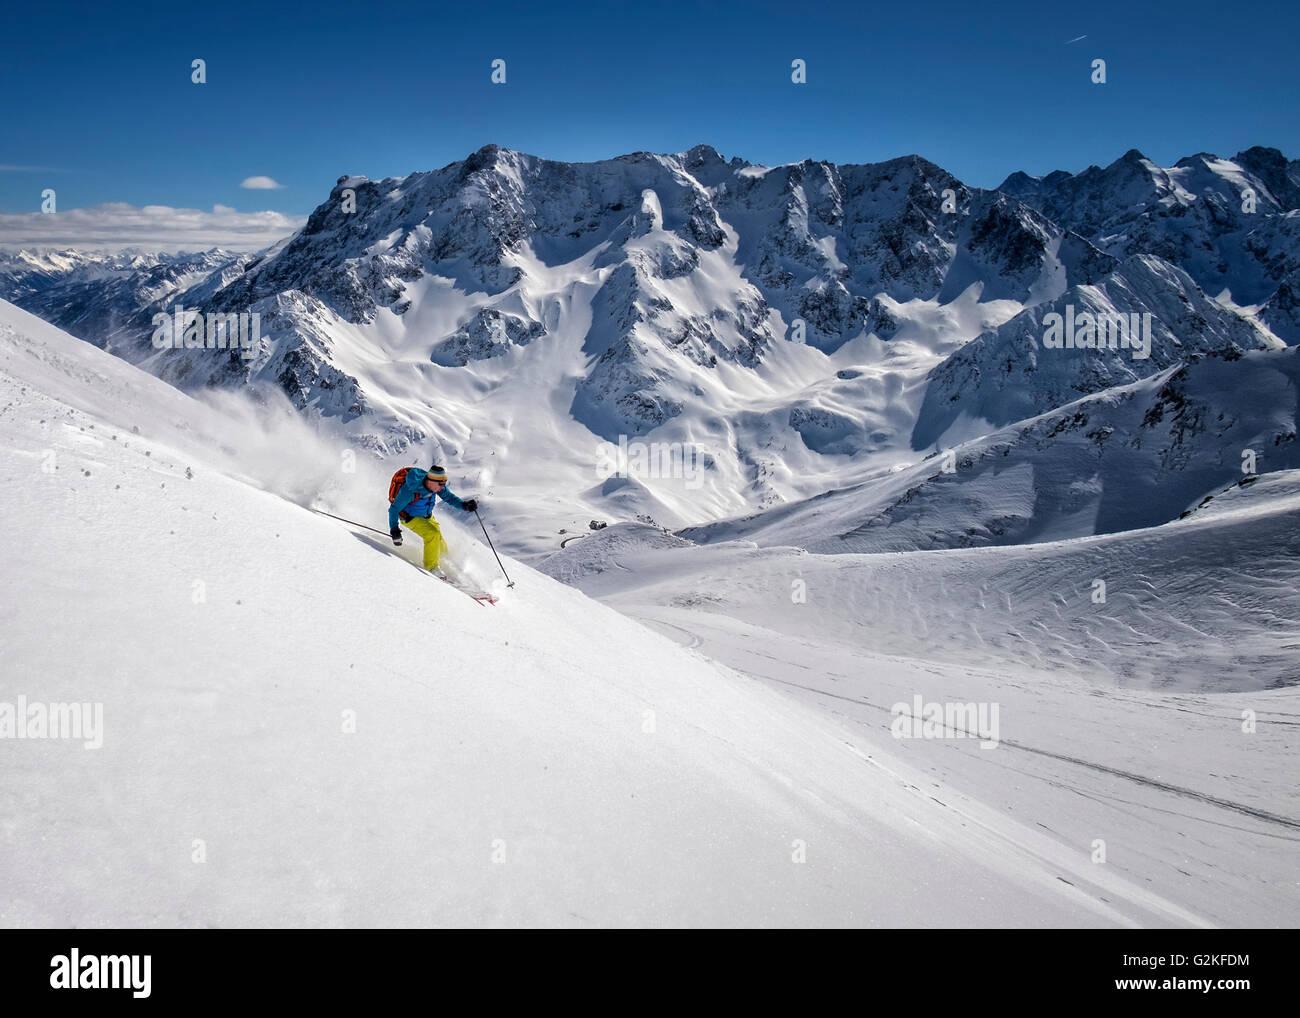 France, Isere, Les Deux Alpes, Pic du Galibier, ski mountaineering - Stock Image